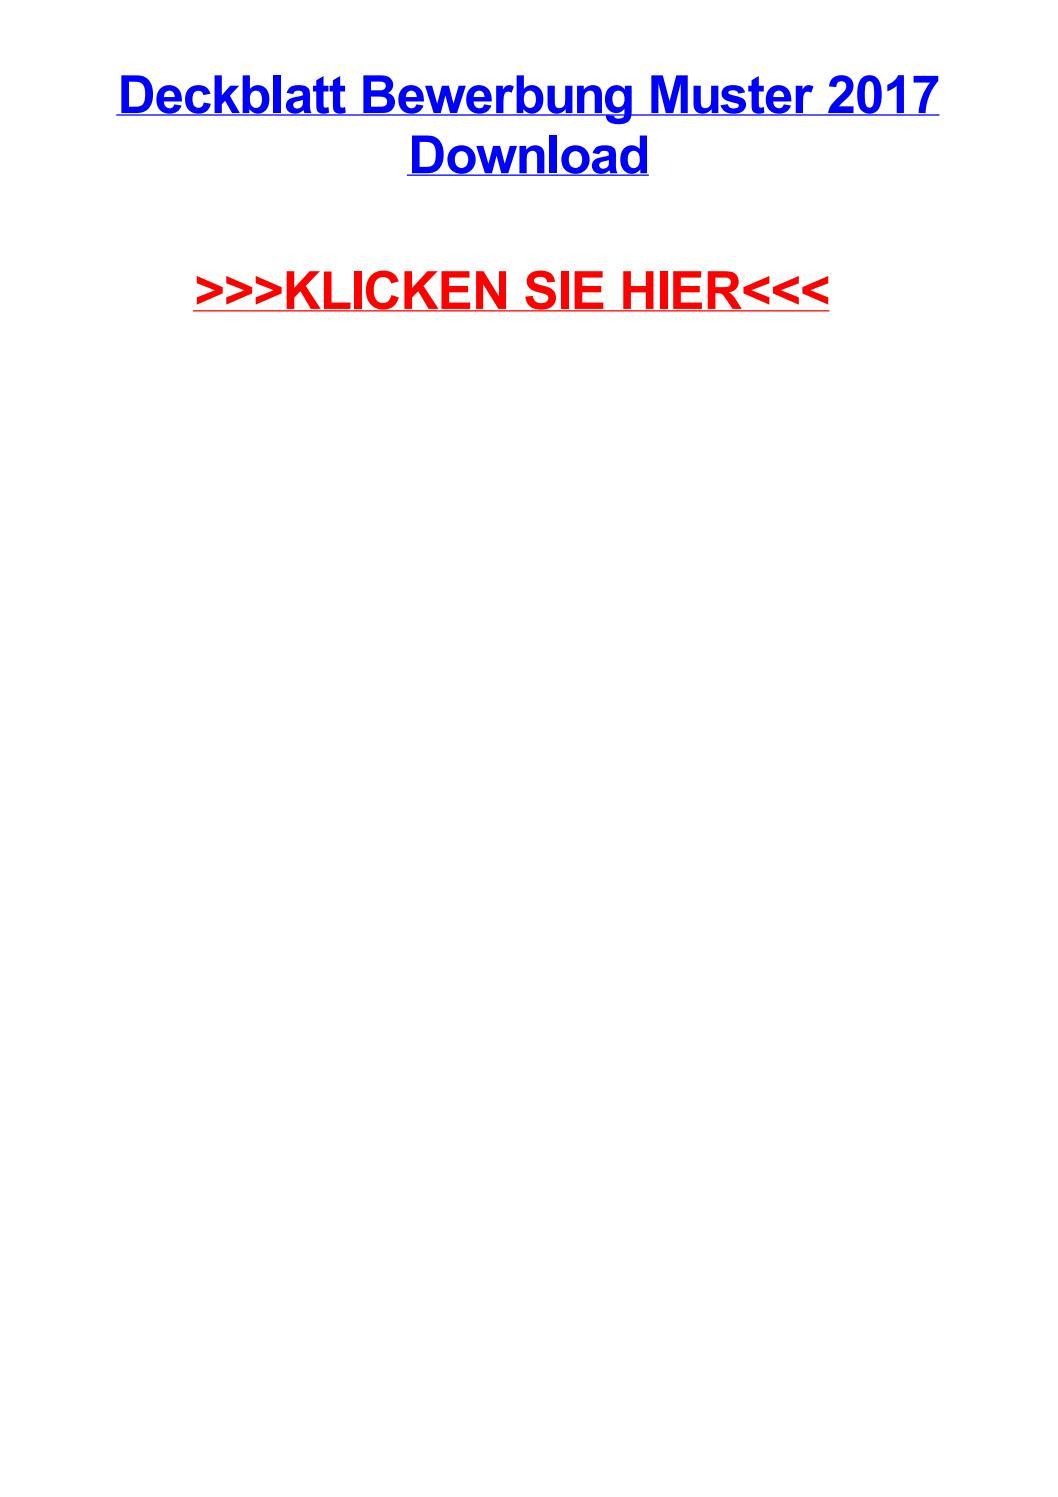 Deckblatt Bewerbung Muster 2017 Download By Amandadmwfx Issuu